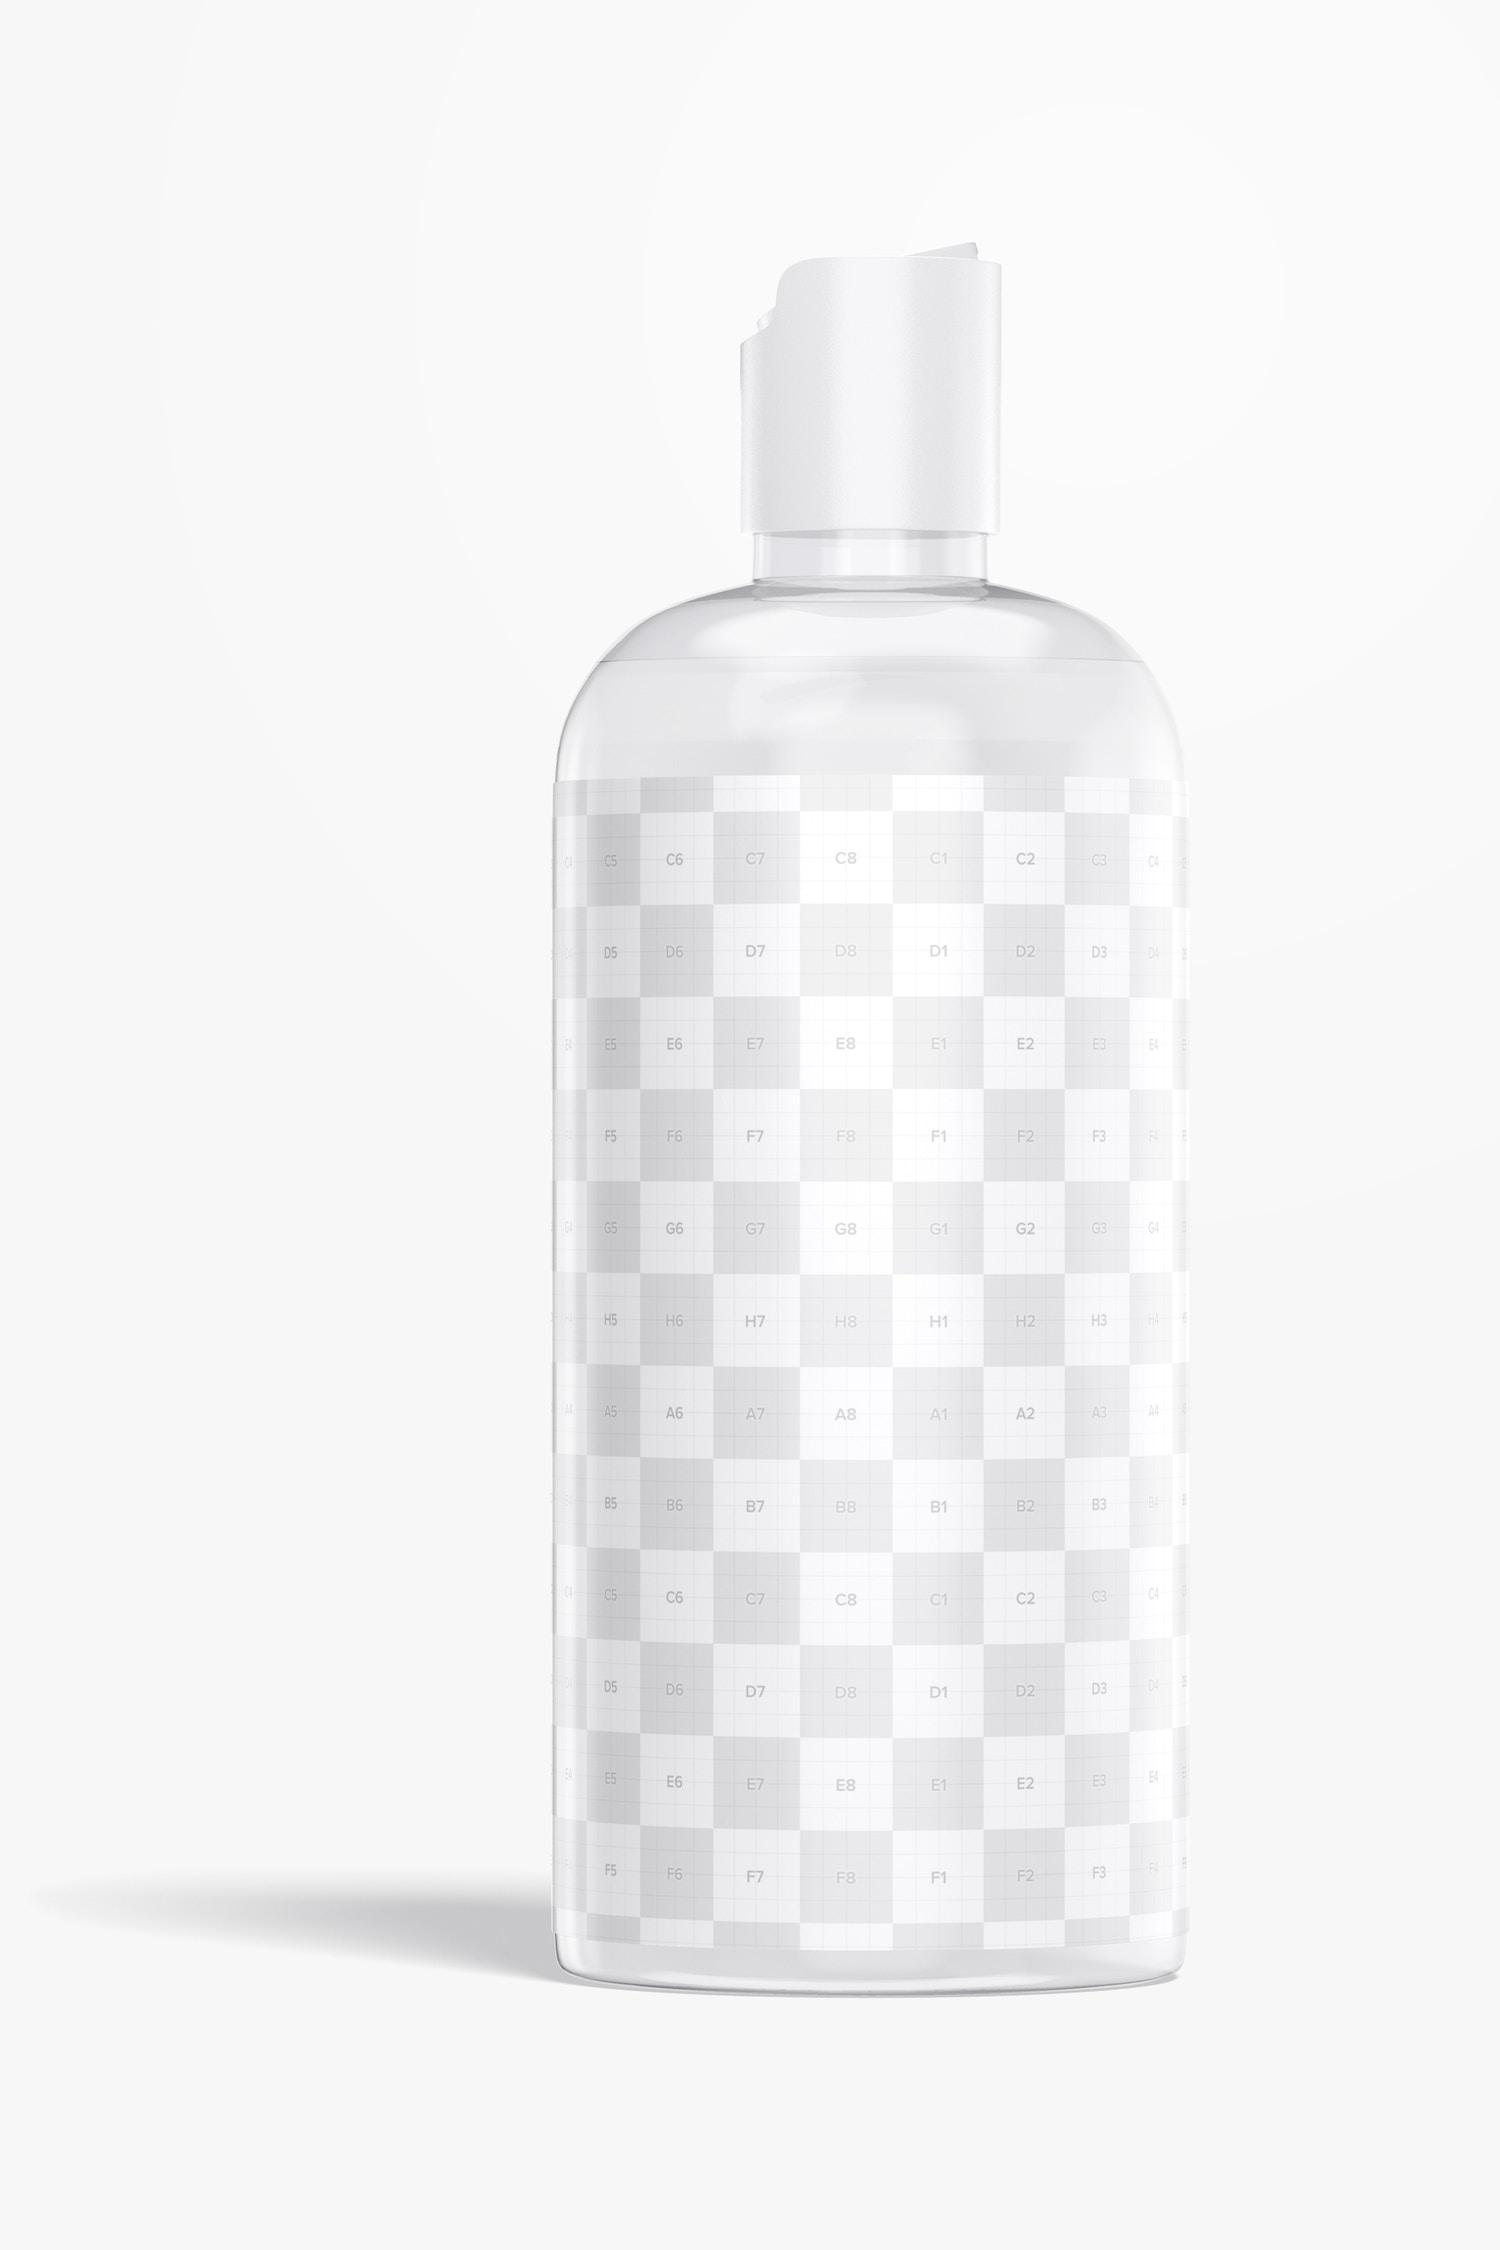 Plastic Body Wash Bottle Mockup